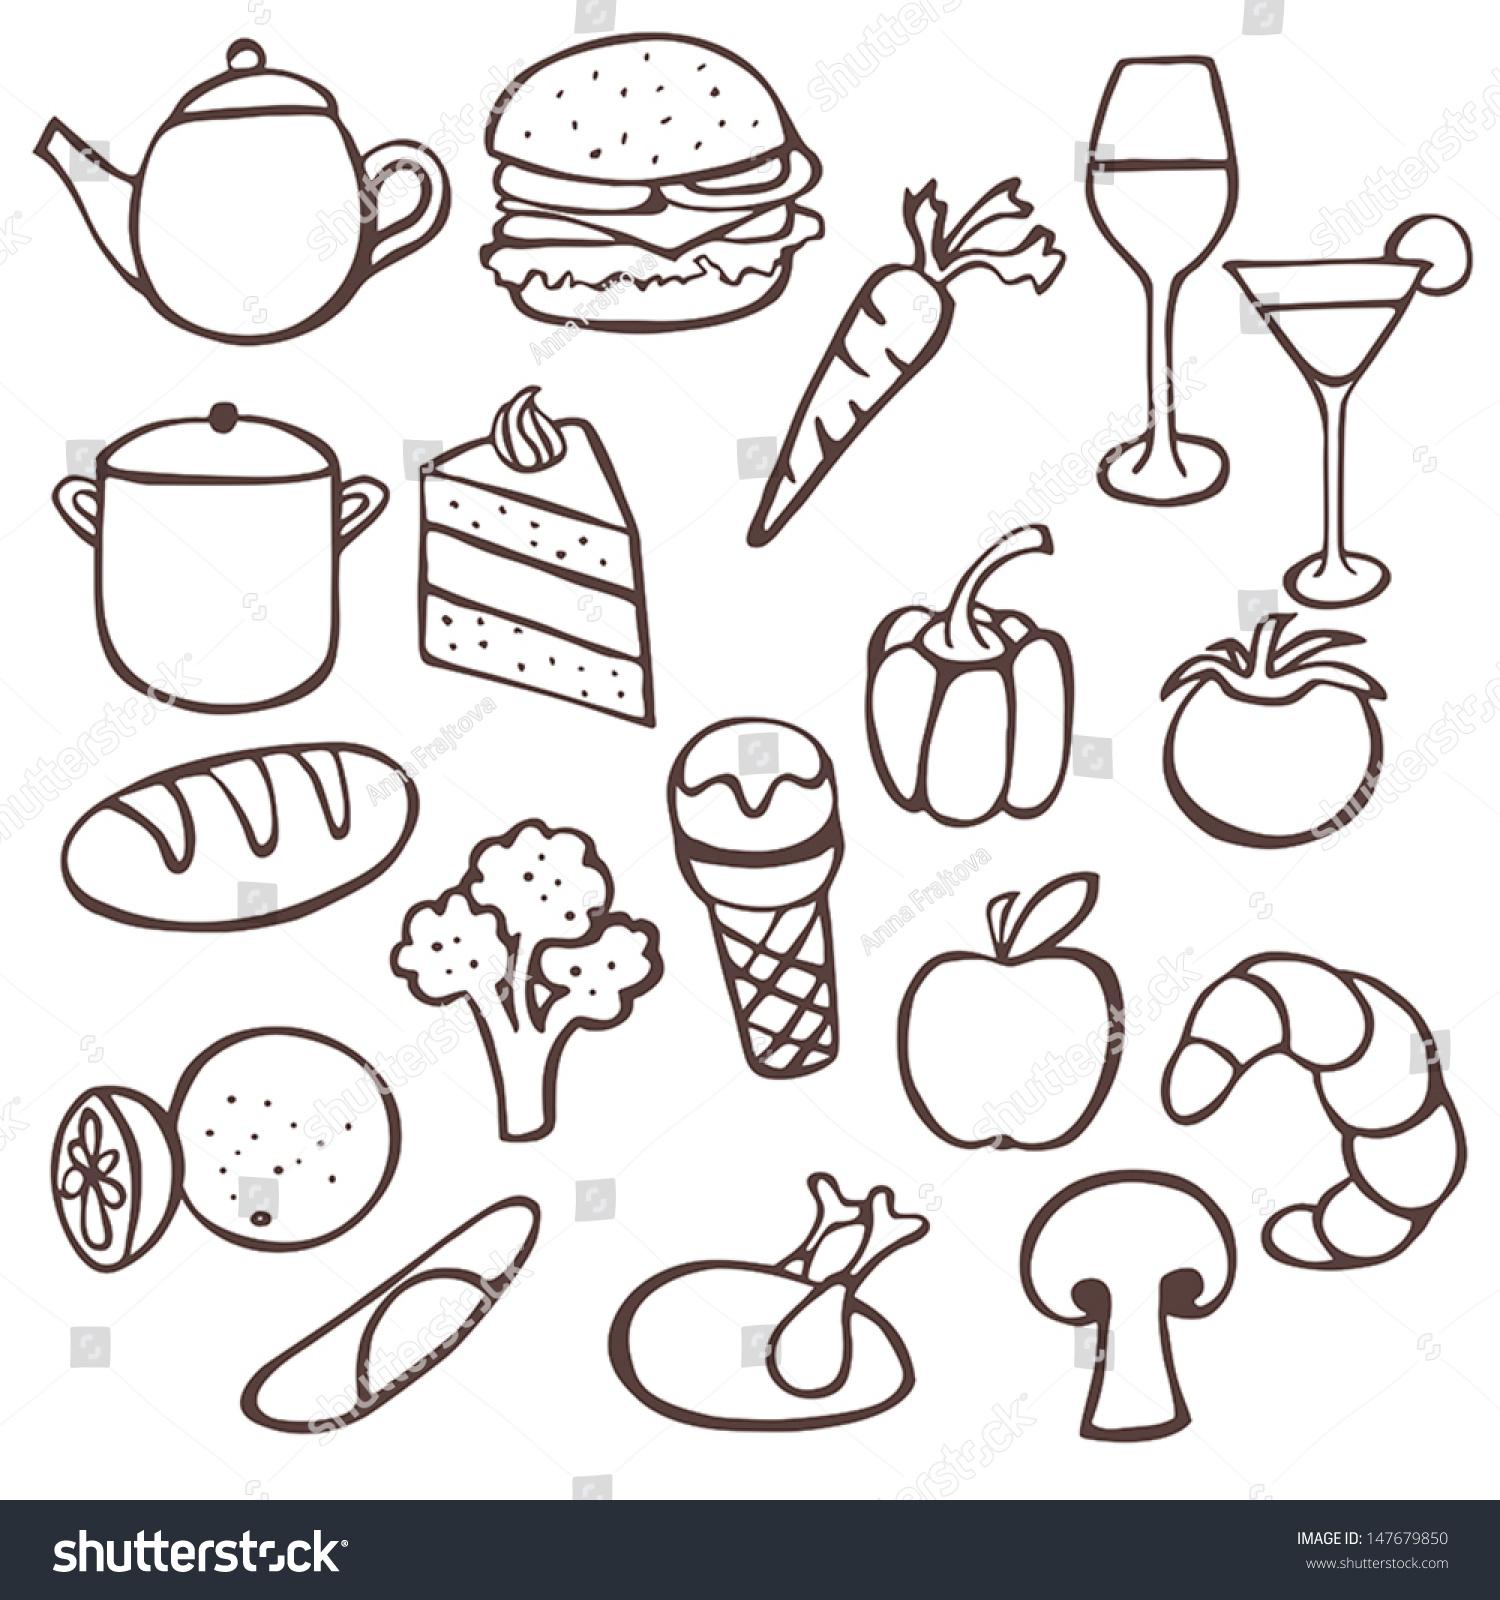 Kitchen tools drawing -  Kitchen Tools Drawings Download